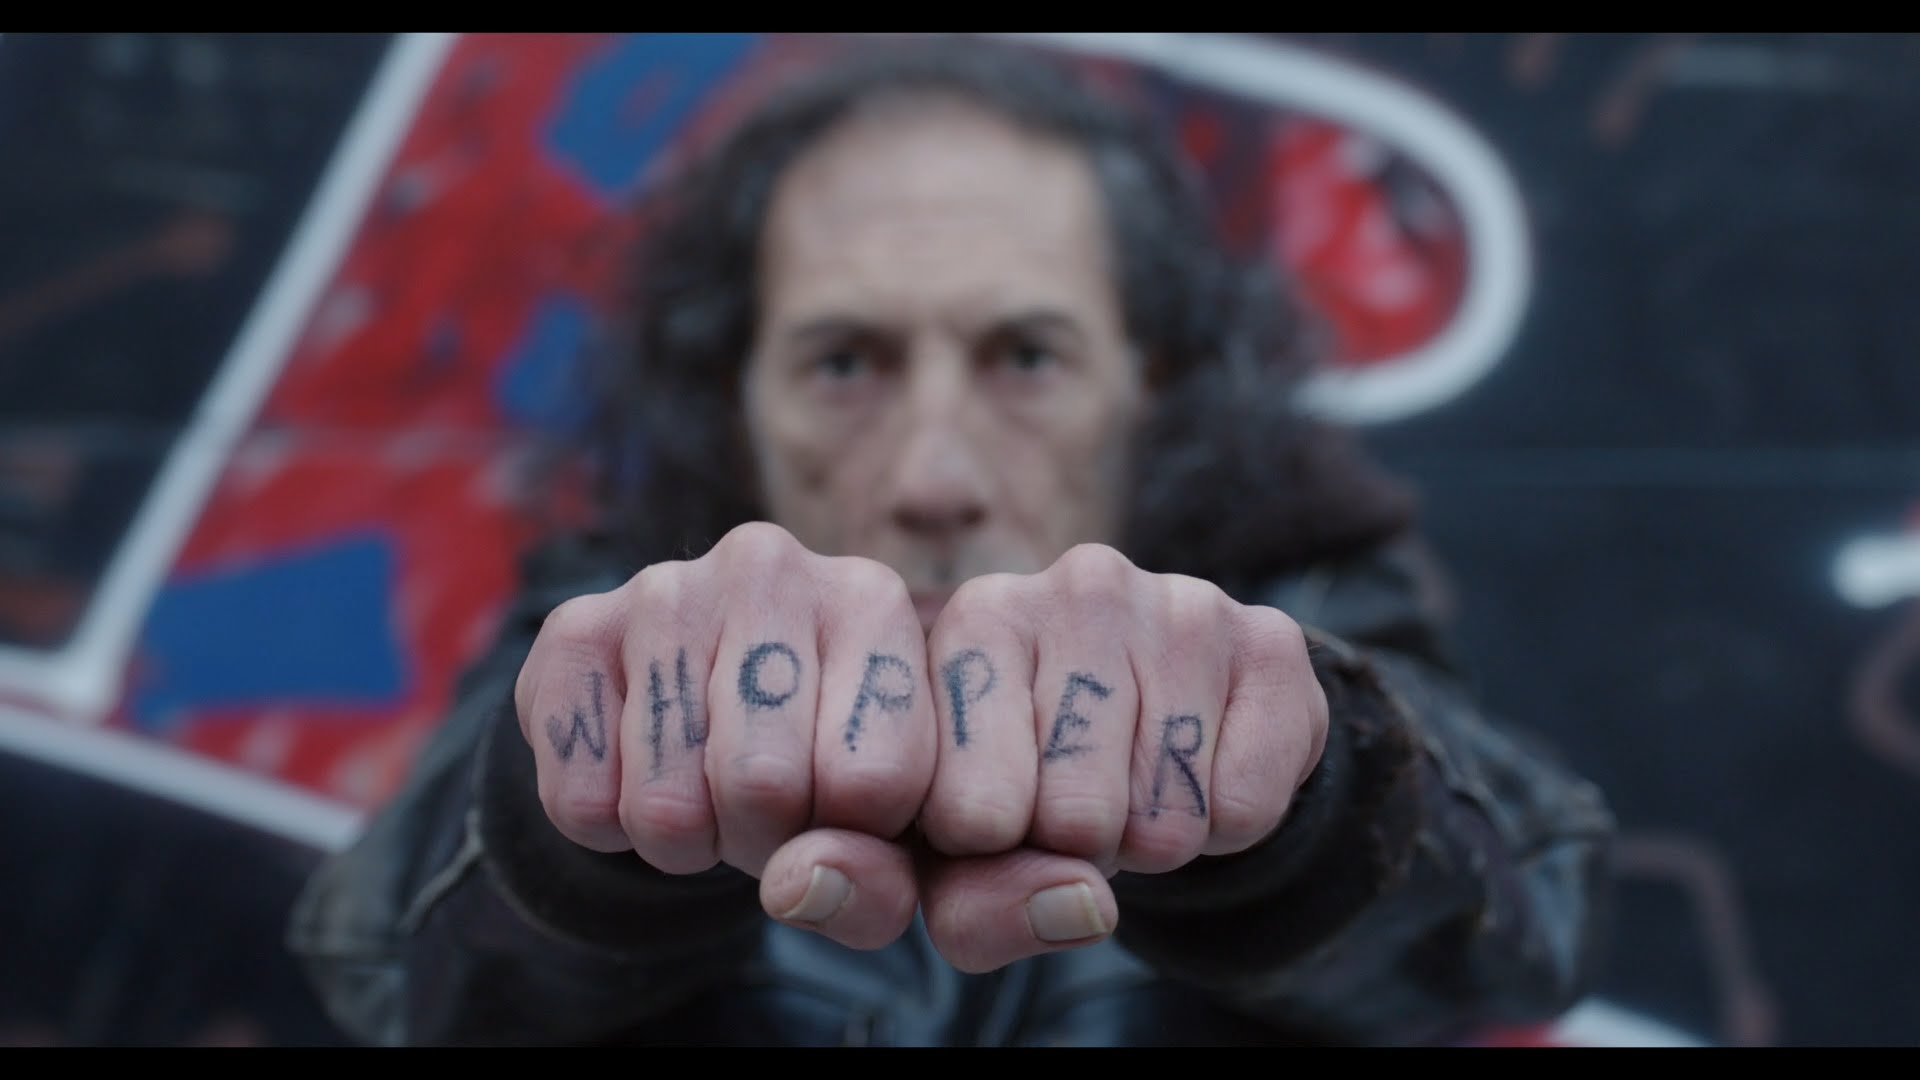 blackout-whopper-homme